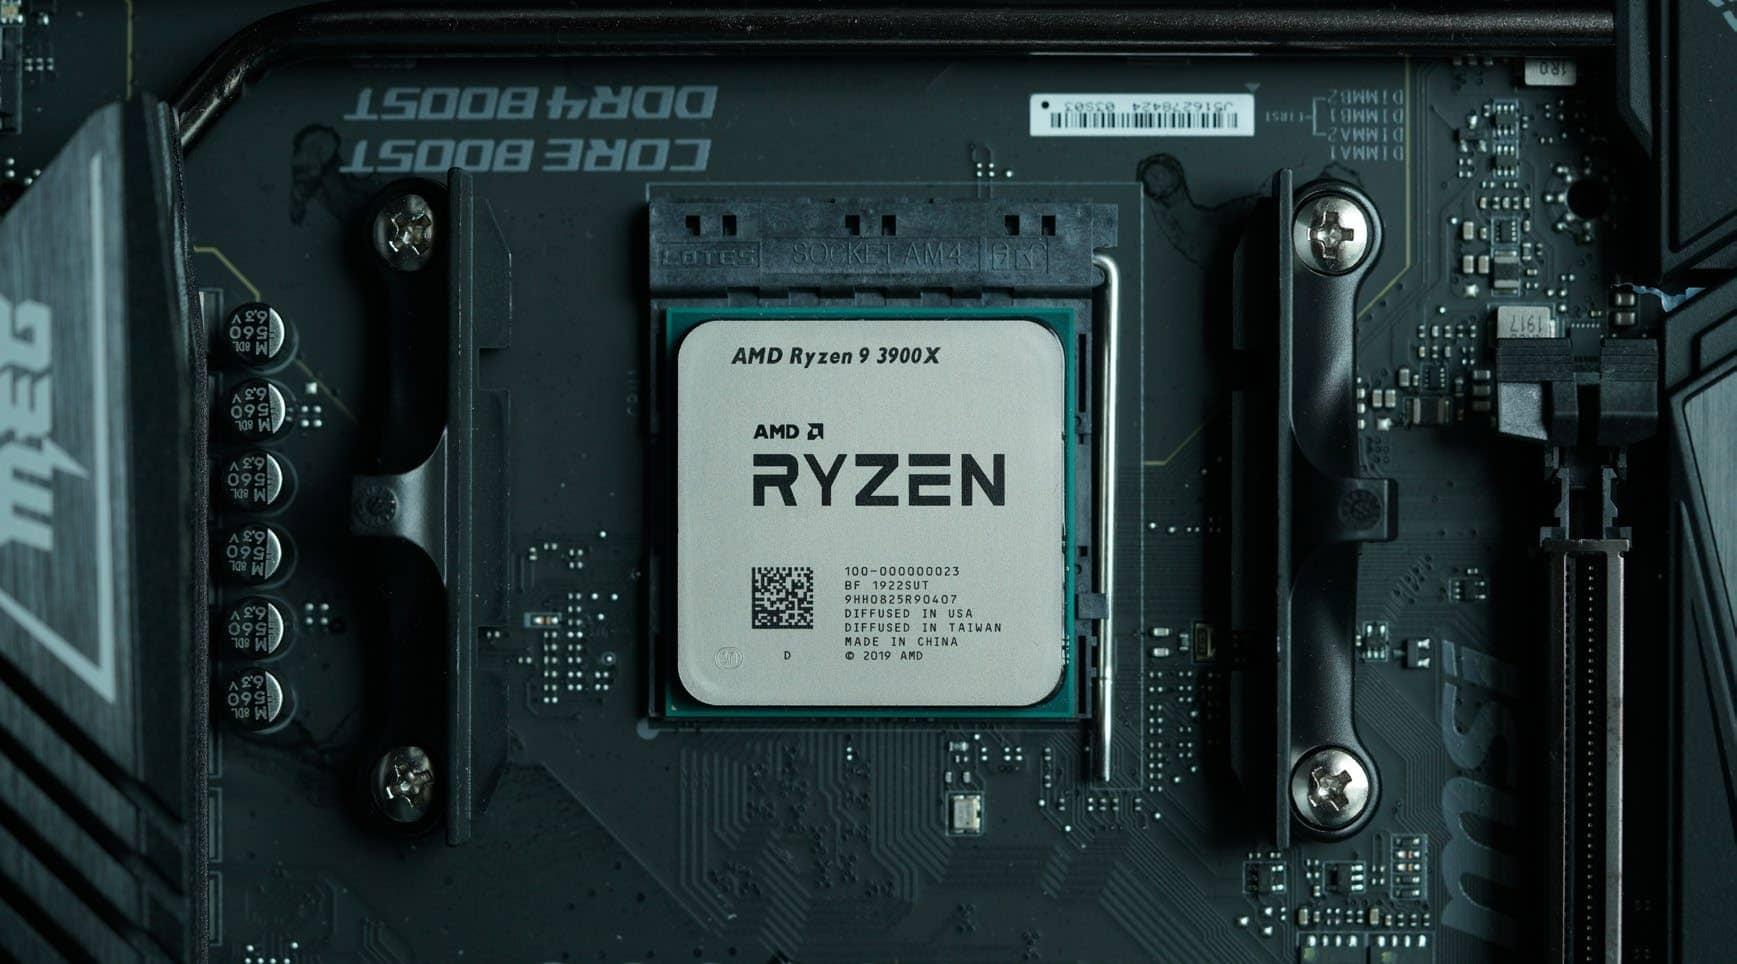 Ryzen 3000: AMD's 12-Core Ryzen 9 3900X Conquers Its Past